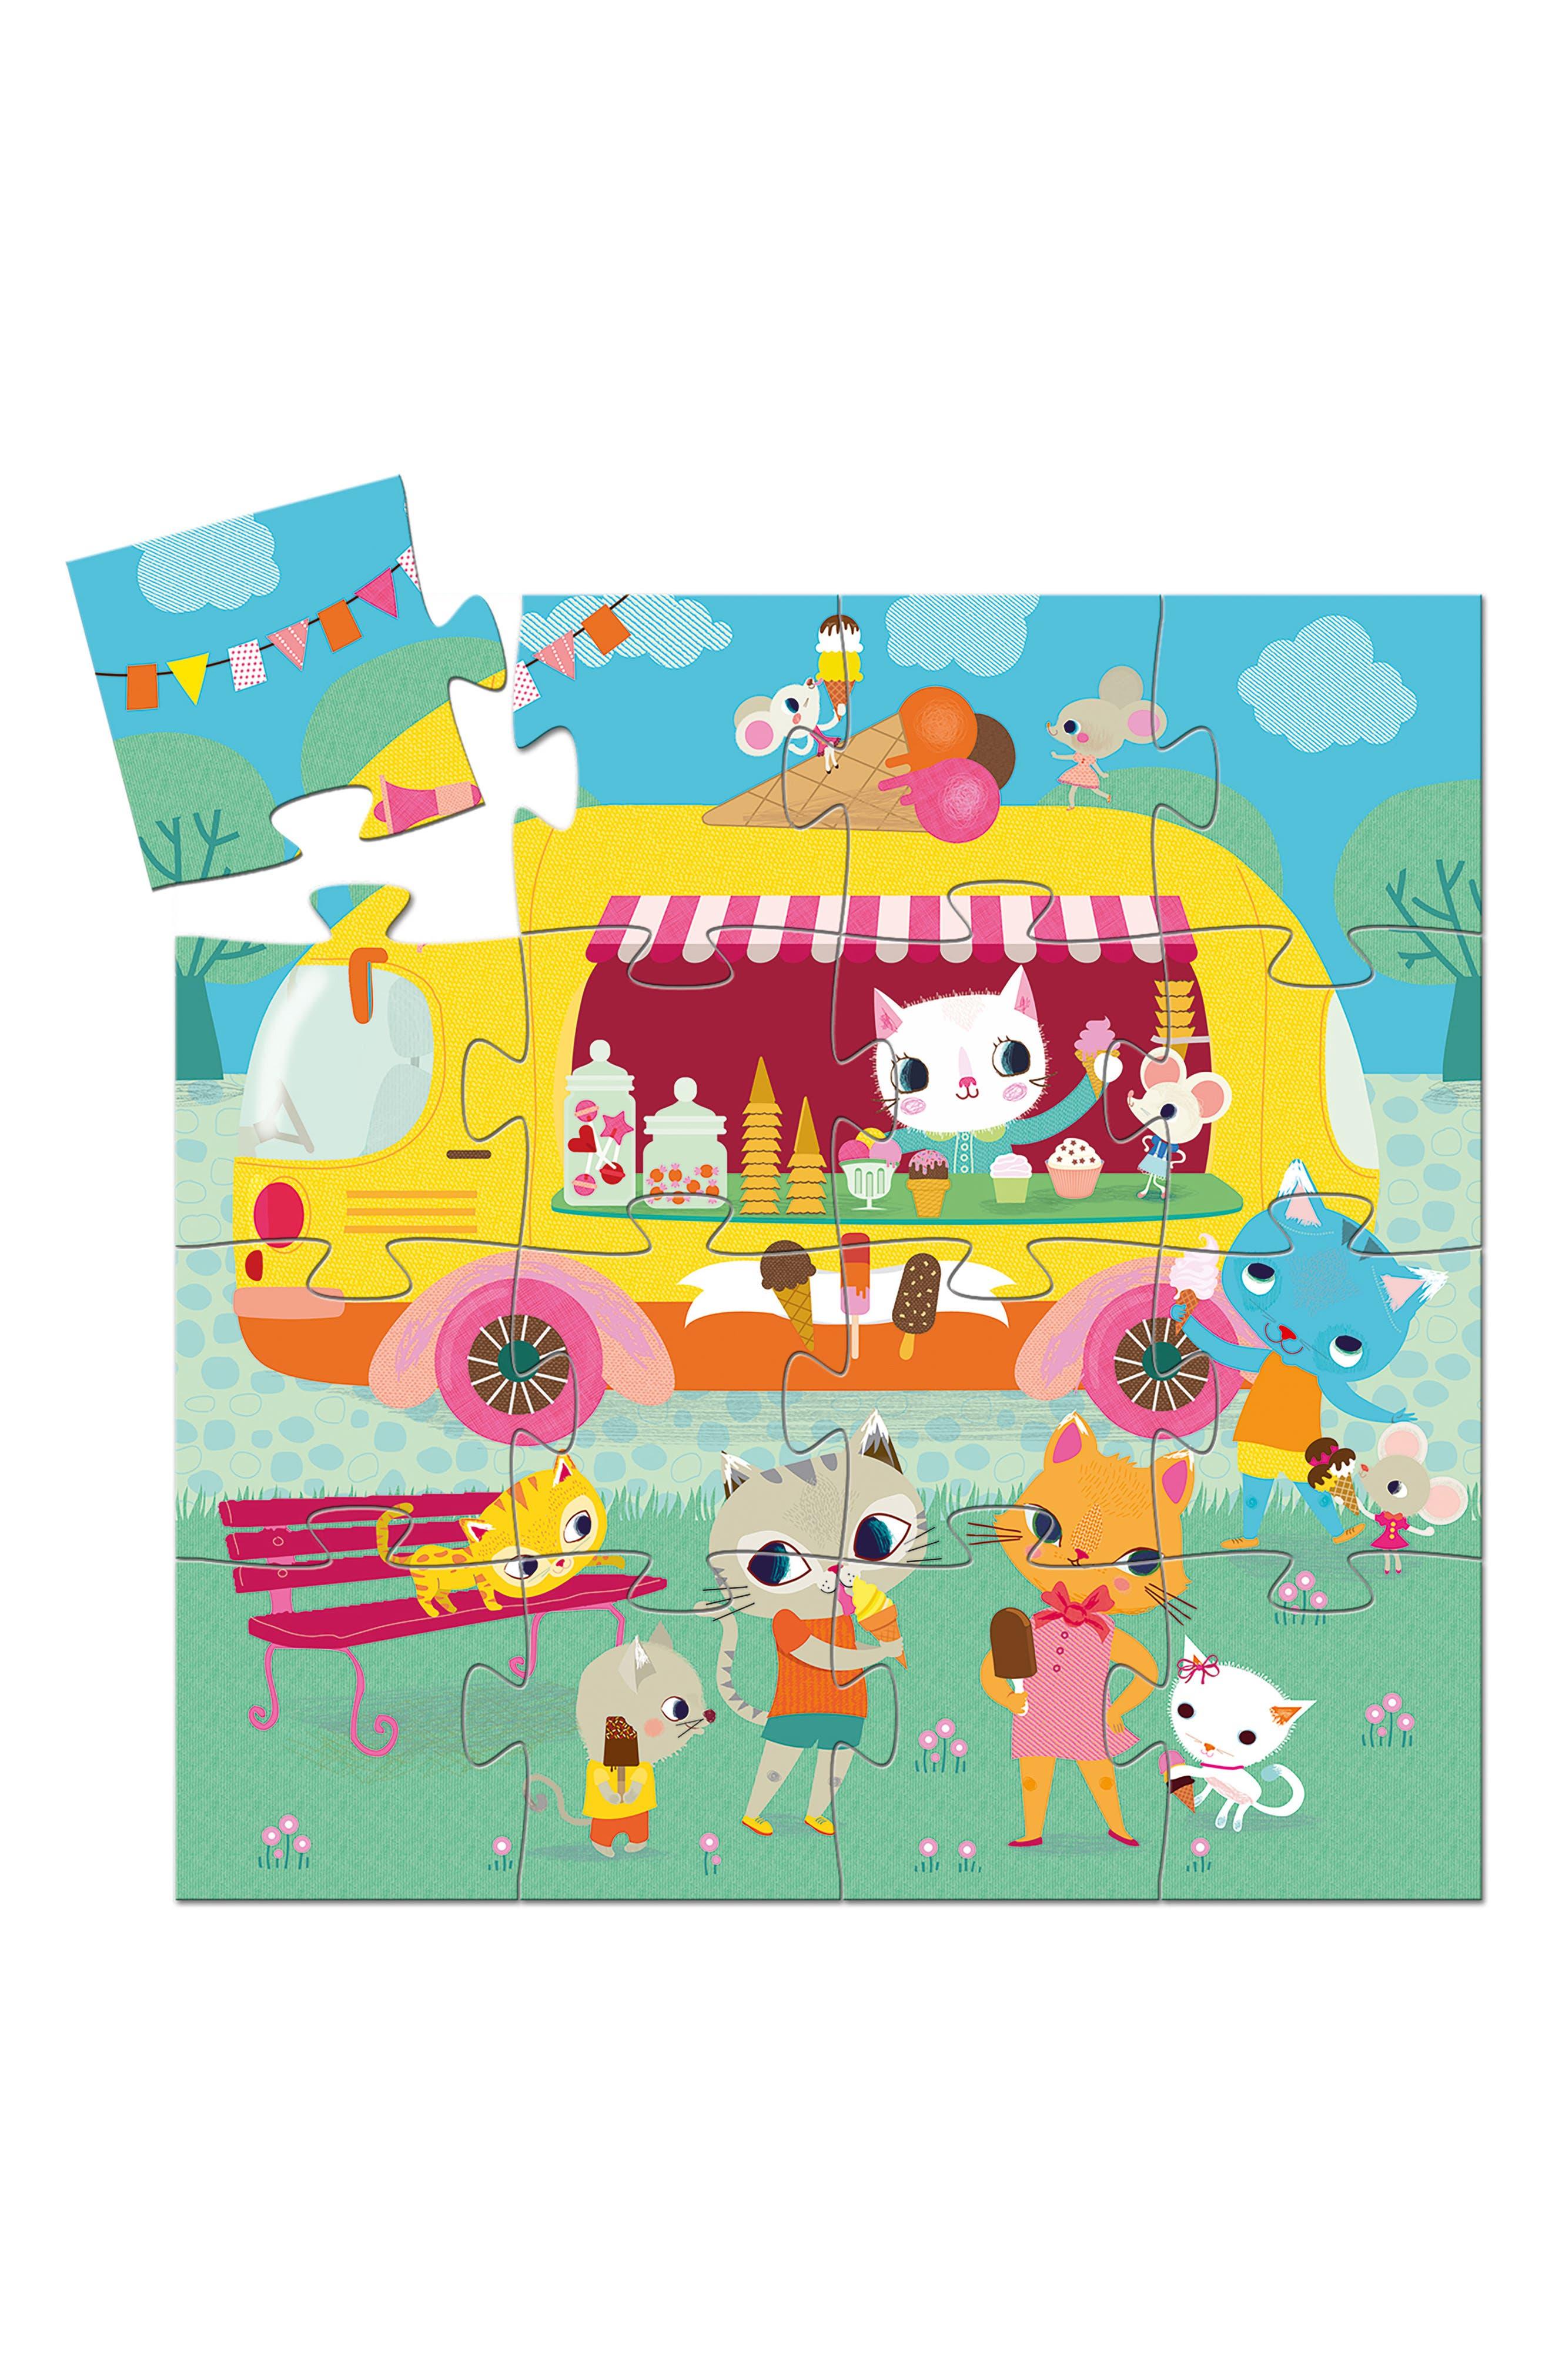 16-Piece Ice Cream Truck Mini Silhouette Puzzle,                             Alternate thumbnail 2, color,                             Multi